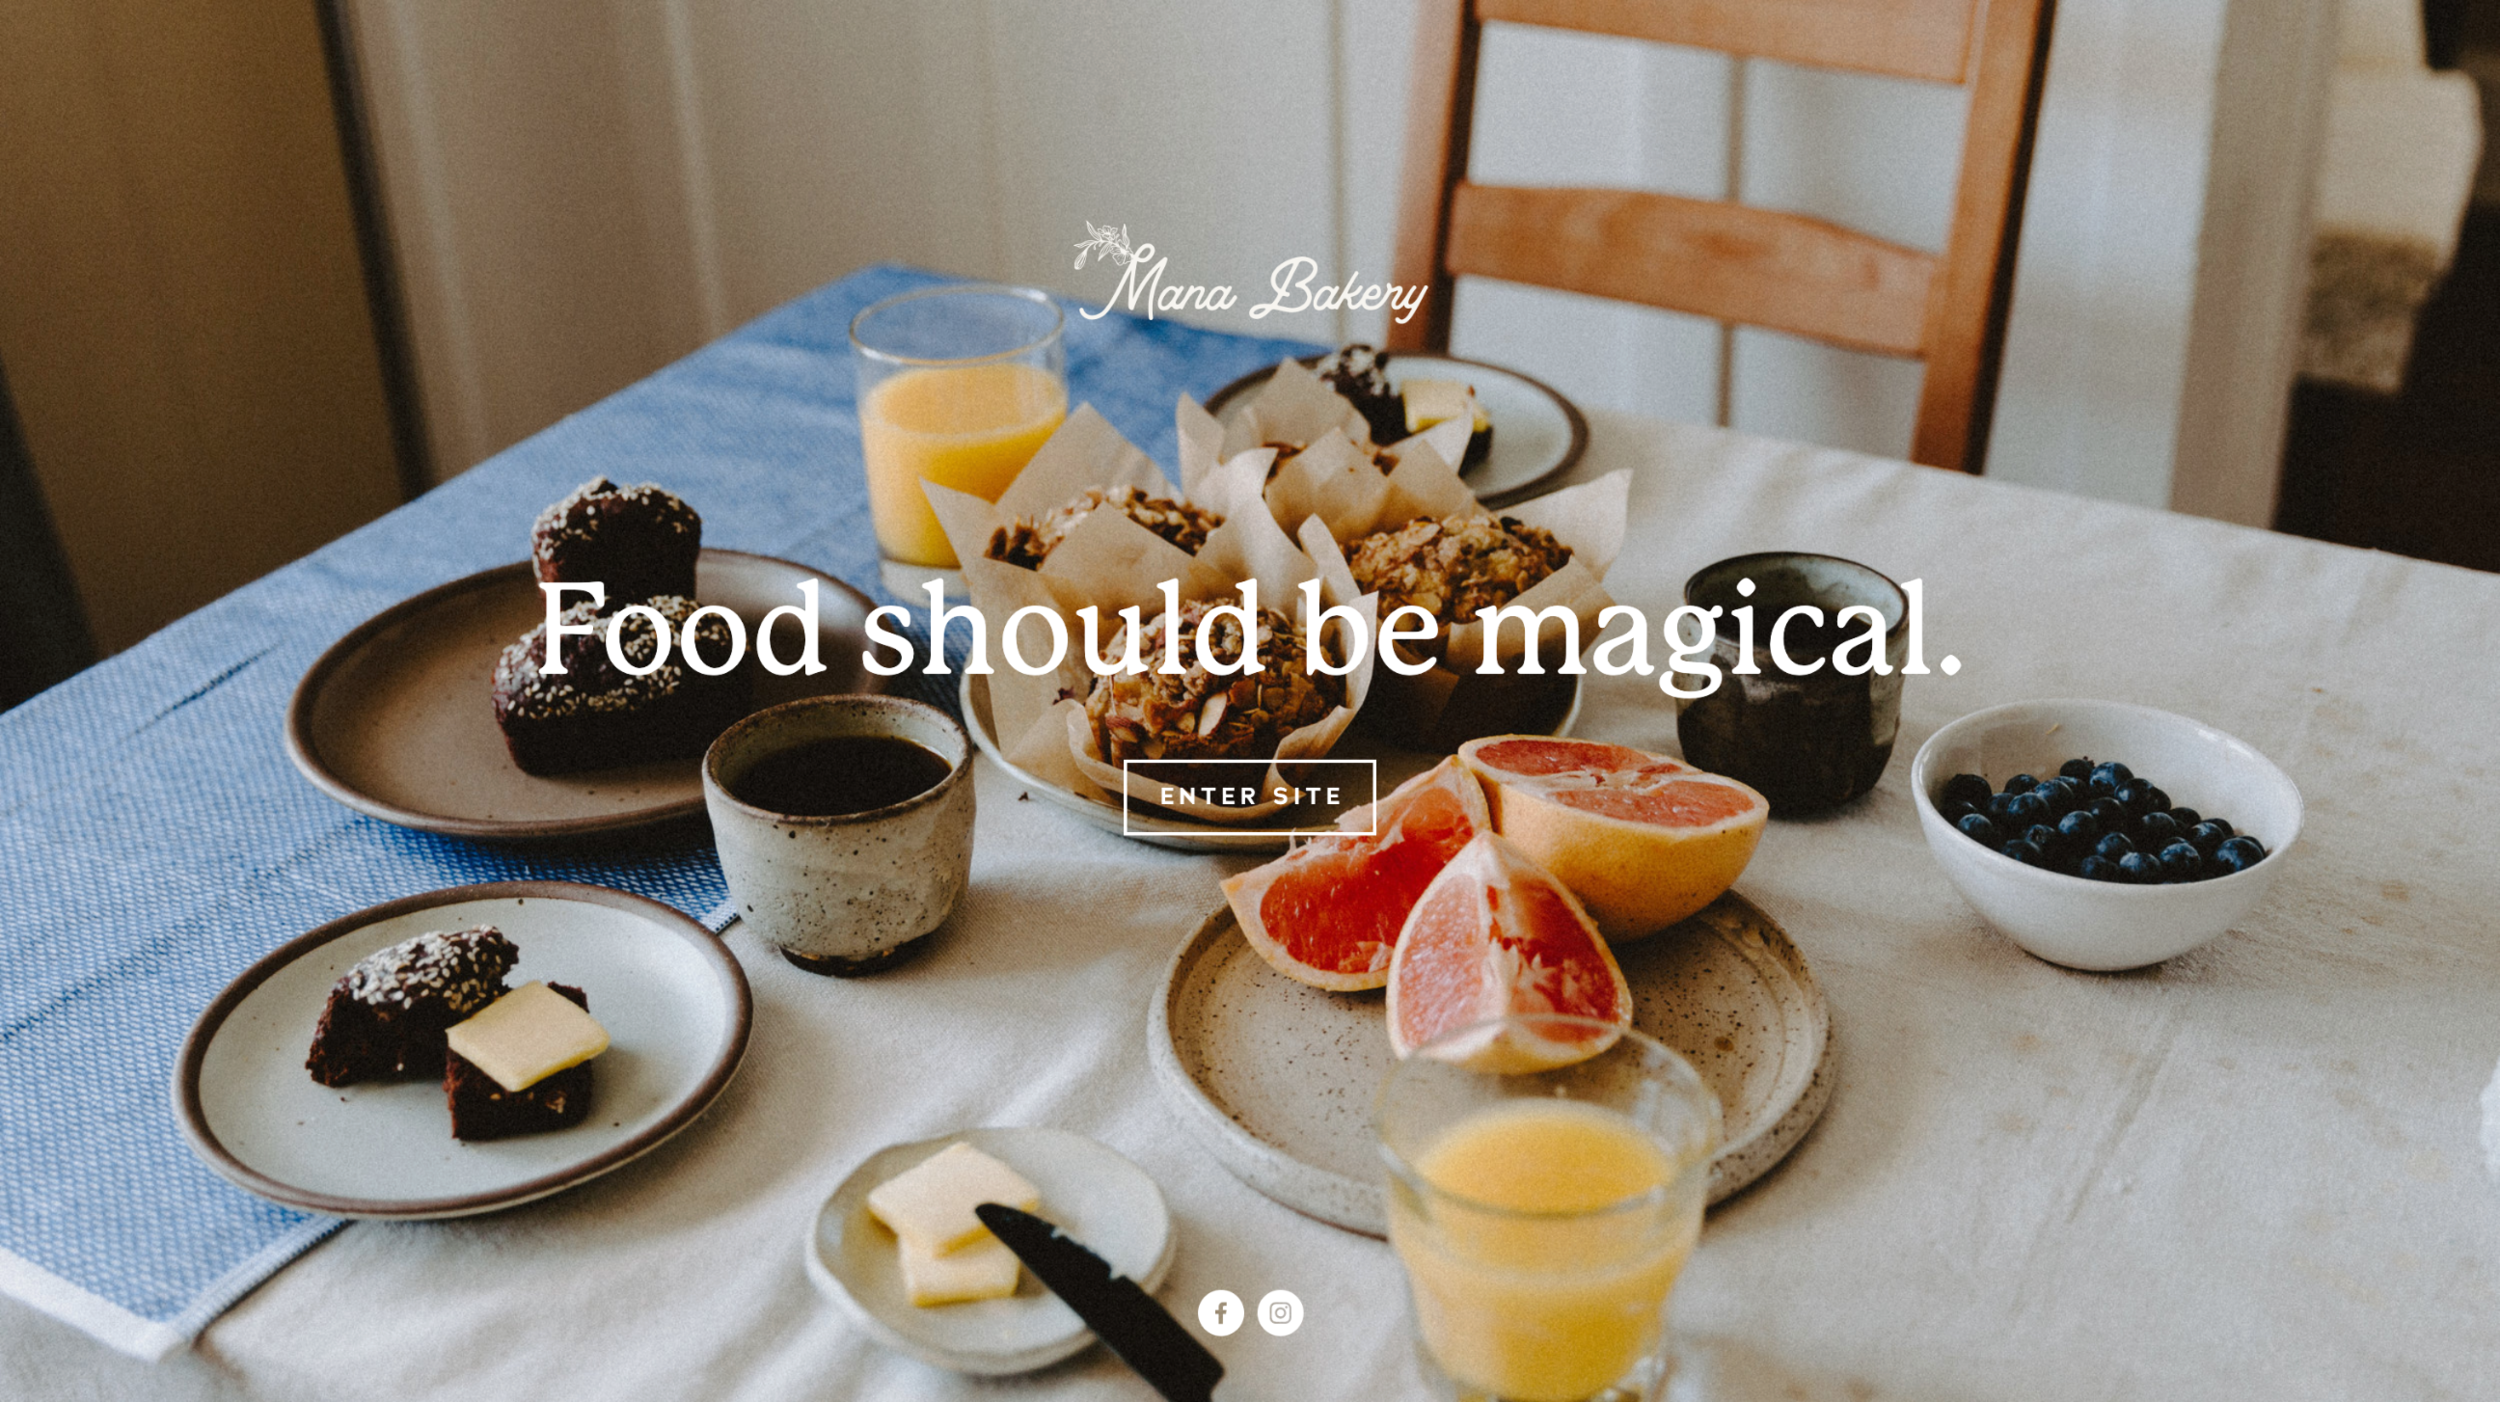 Mana-Bakery-Website@2x.png